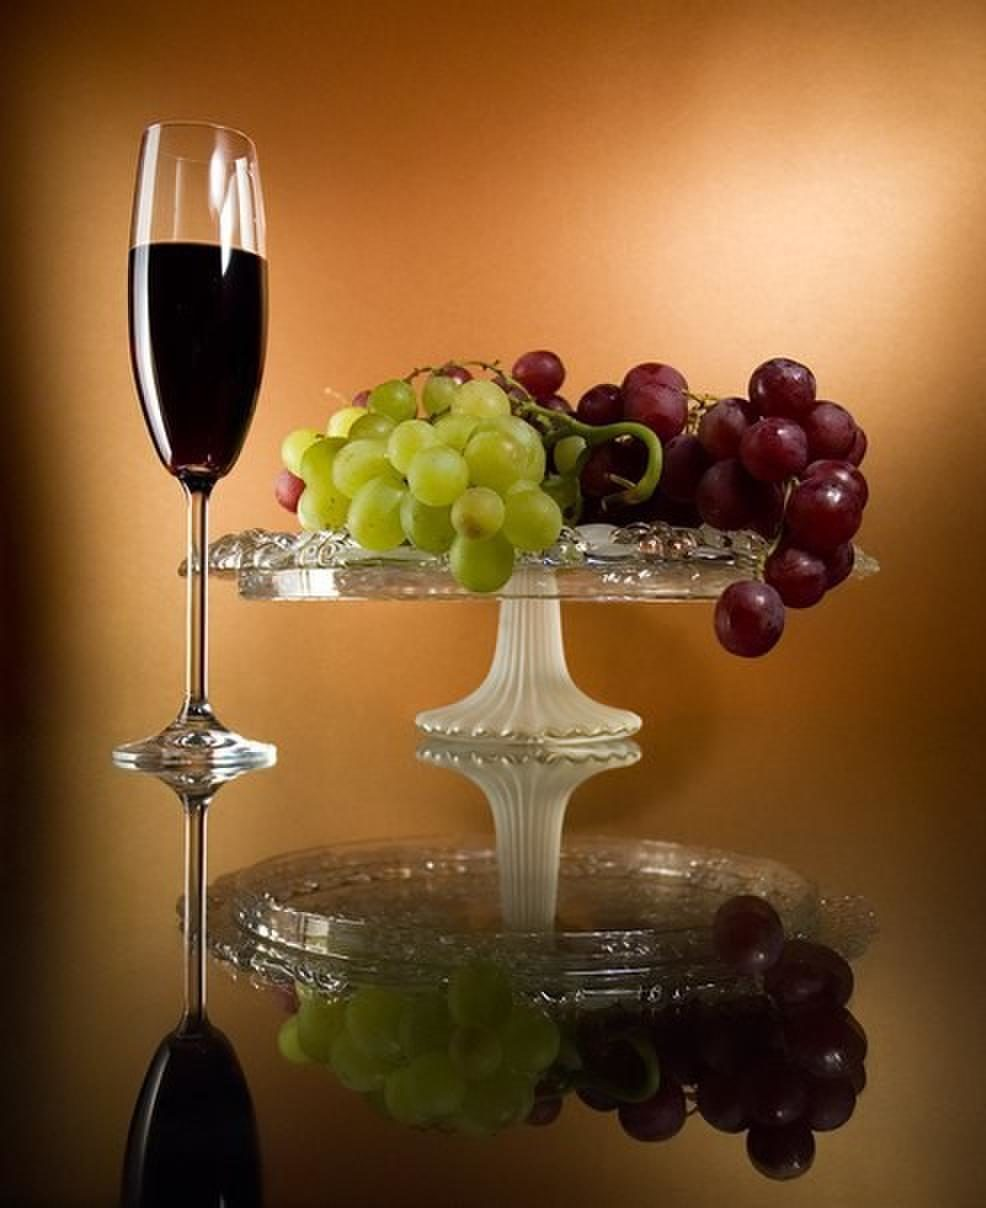 Открытки, открытки бокалы вино